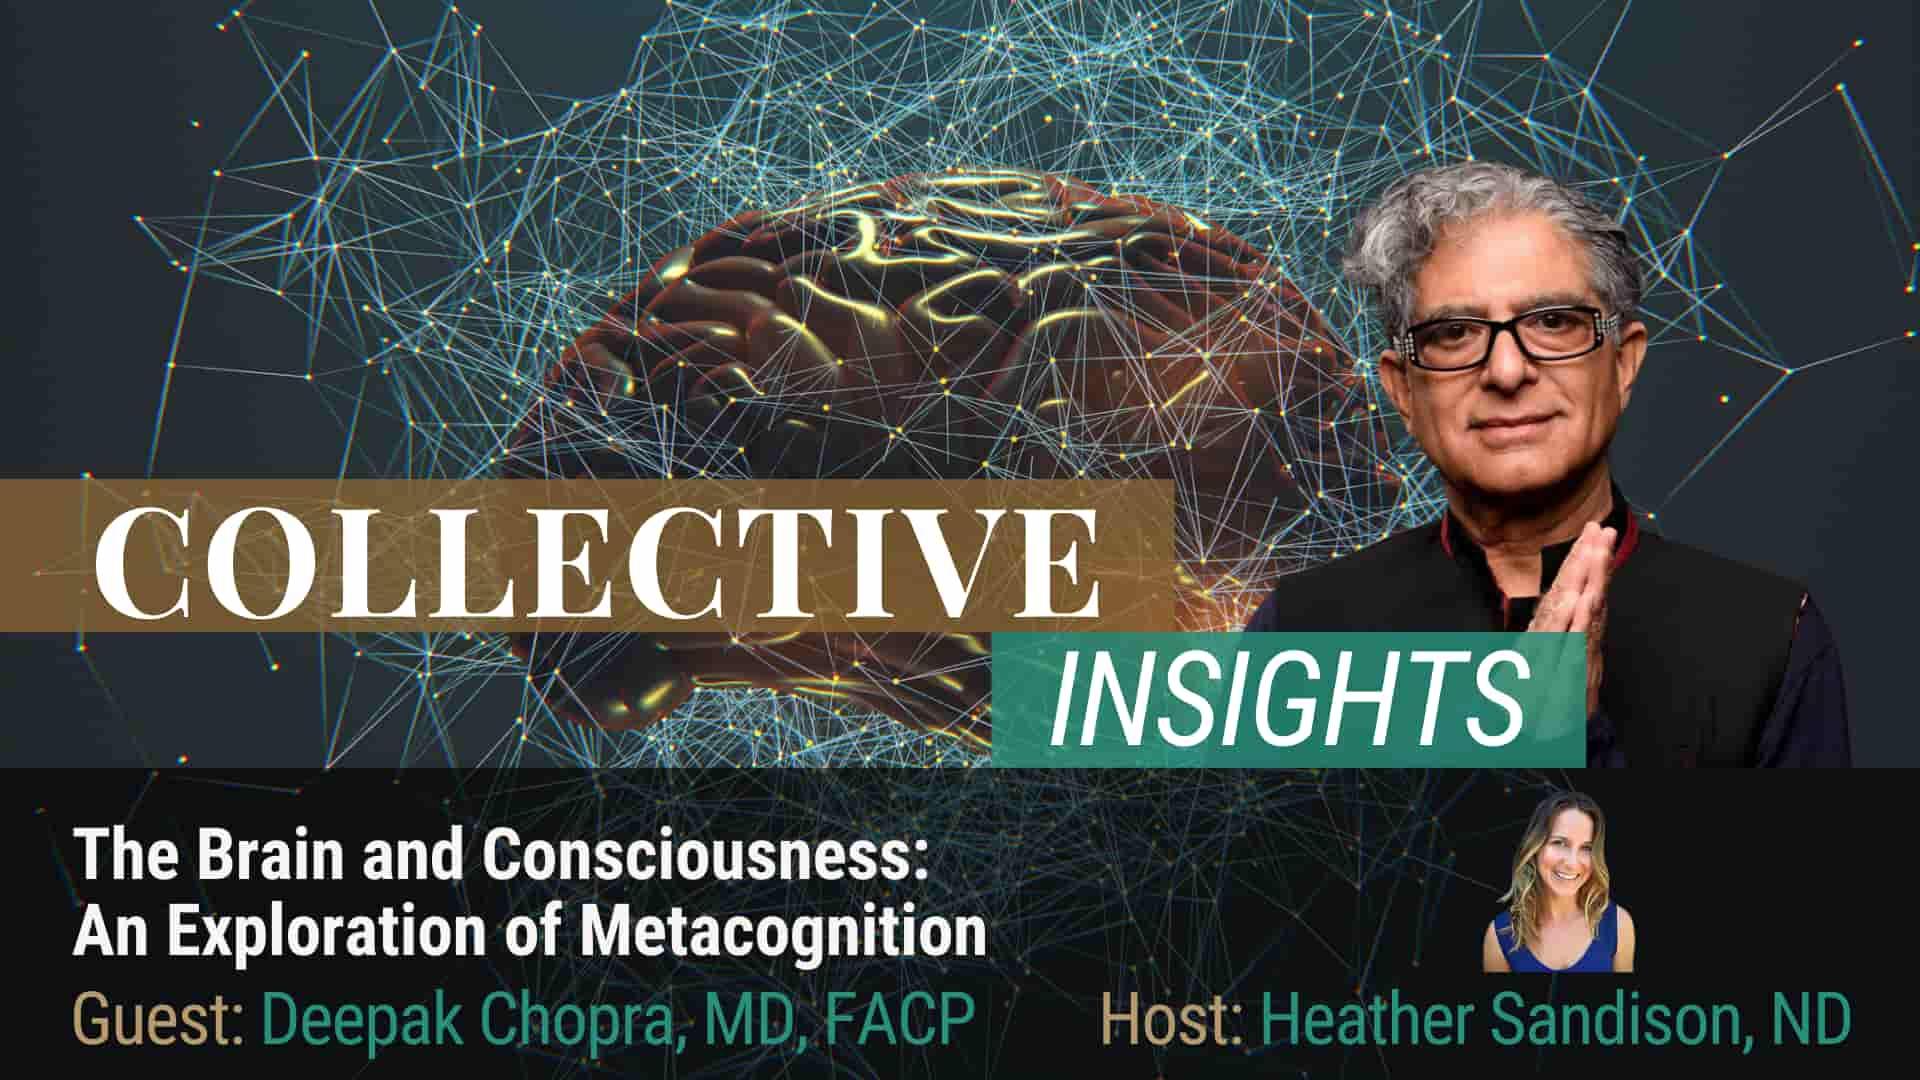 The Science of the Brain & Consciousness - Deepak Chopra, MD, FACP - Brain